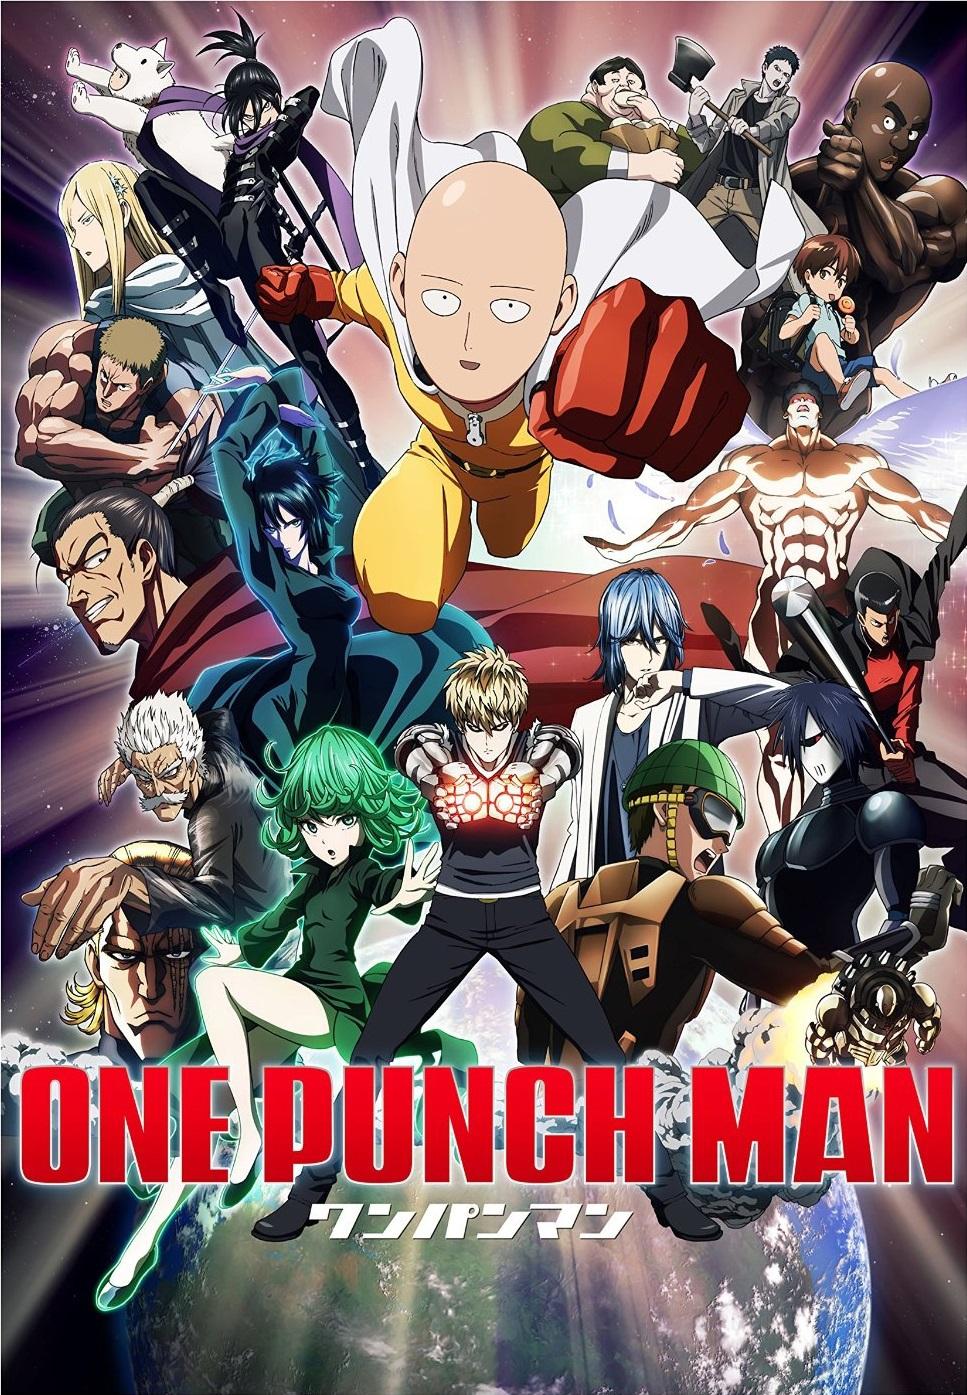 Download 3000+ Wallpaper Android One Punch Man  Paling Keren